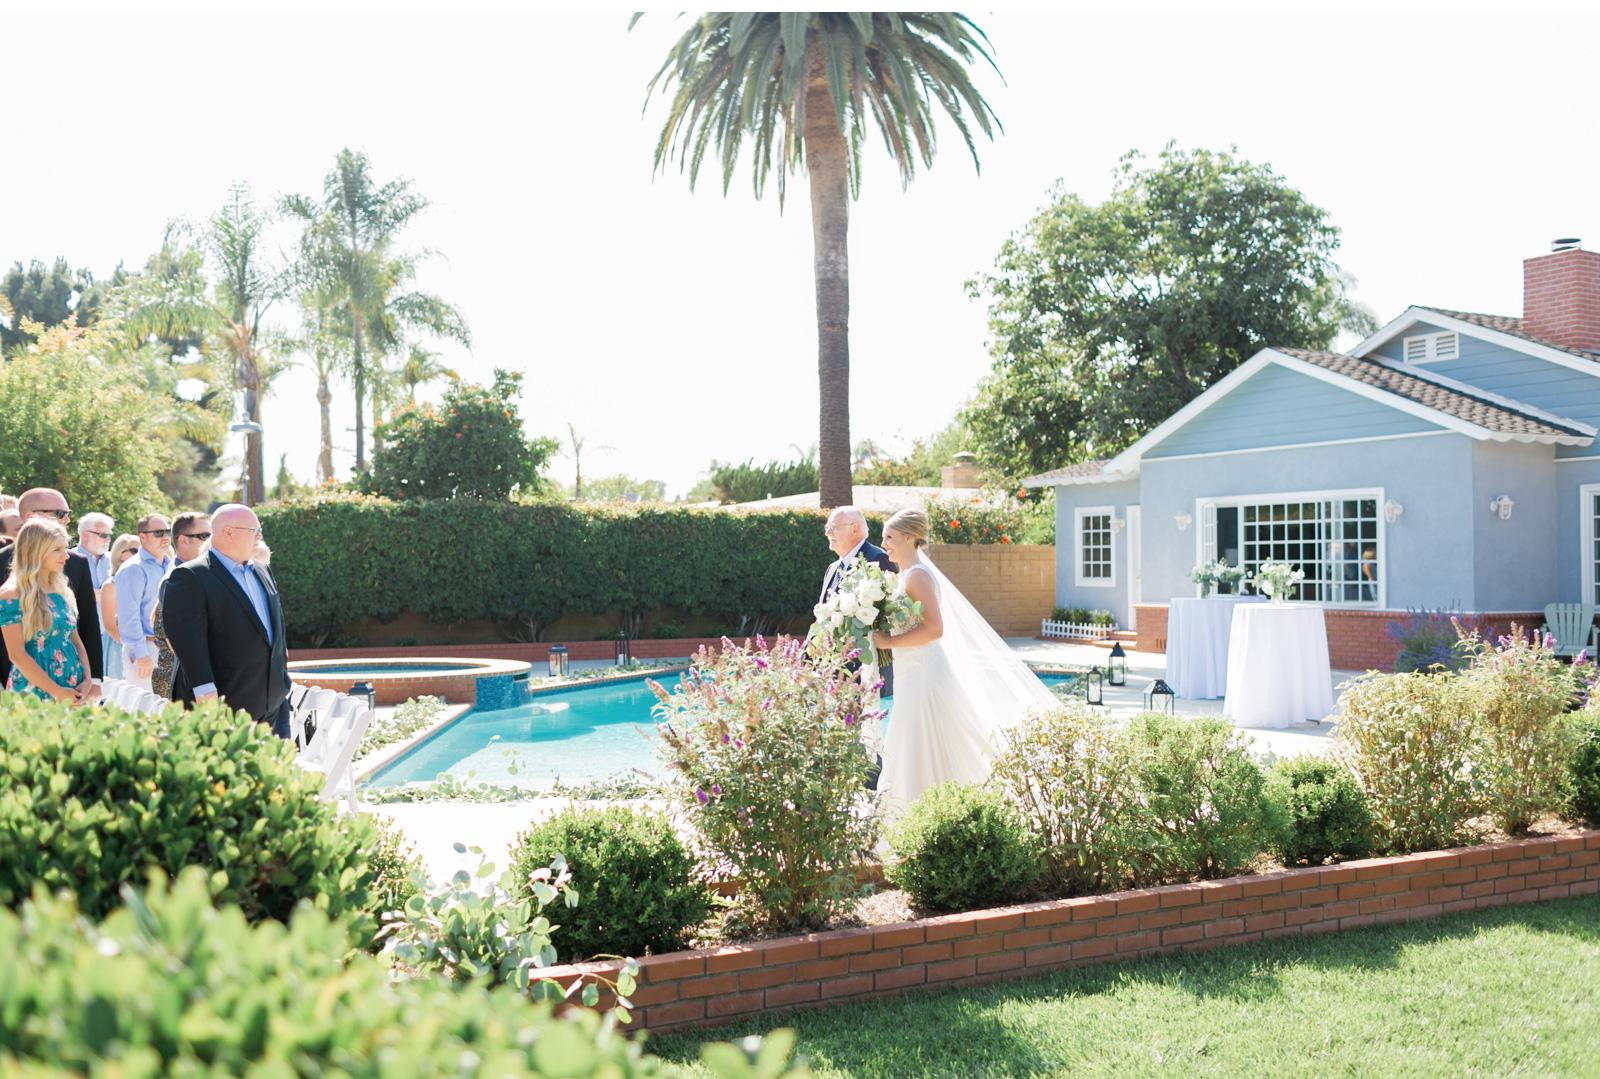 San-Luis-Obispo-Wedding-Photographer-Natalie-Schutt-Photography-Style-Me-Pretty_16.jpg